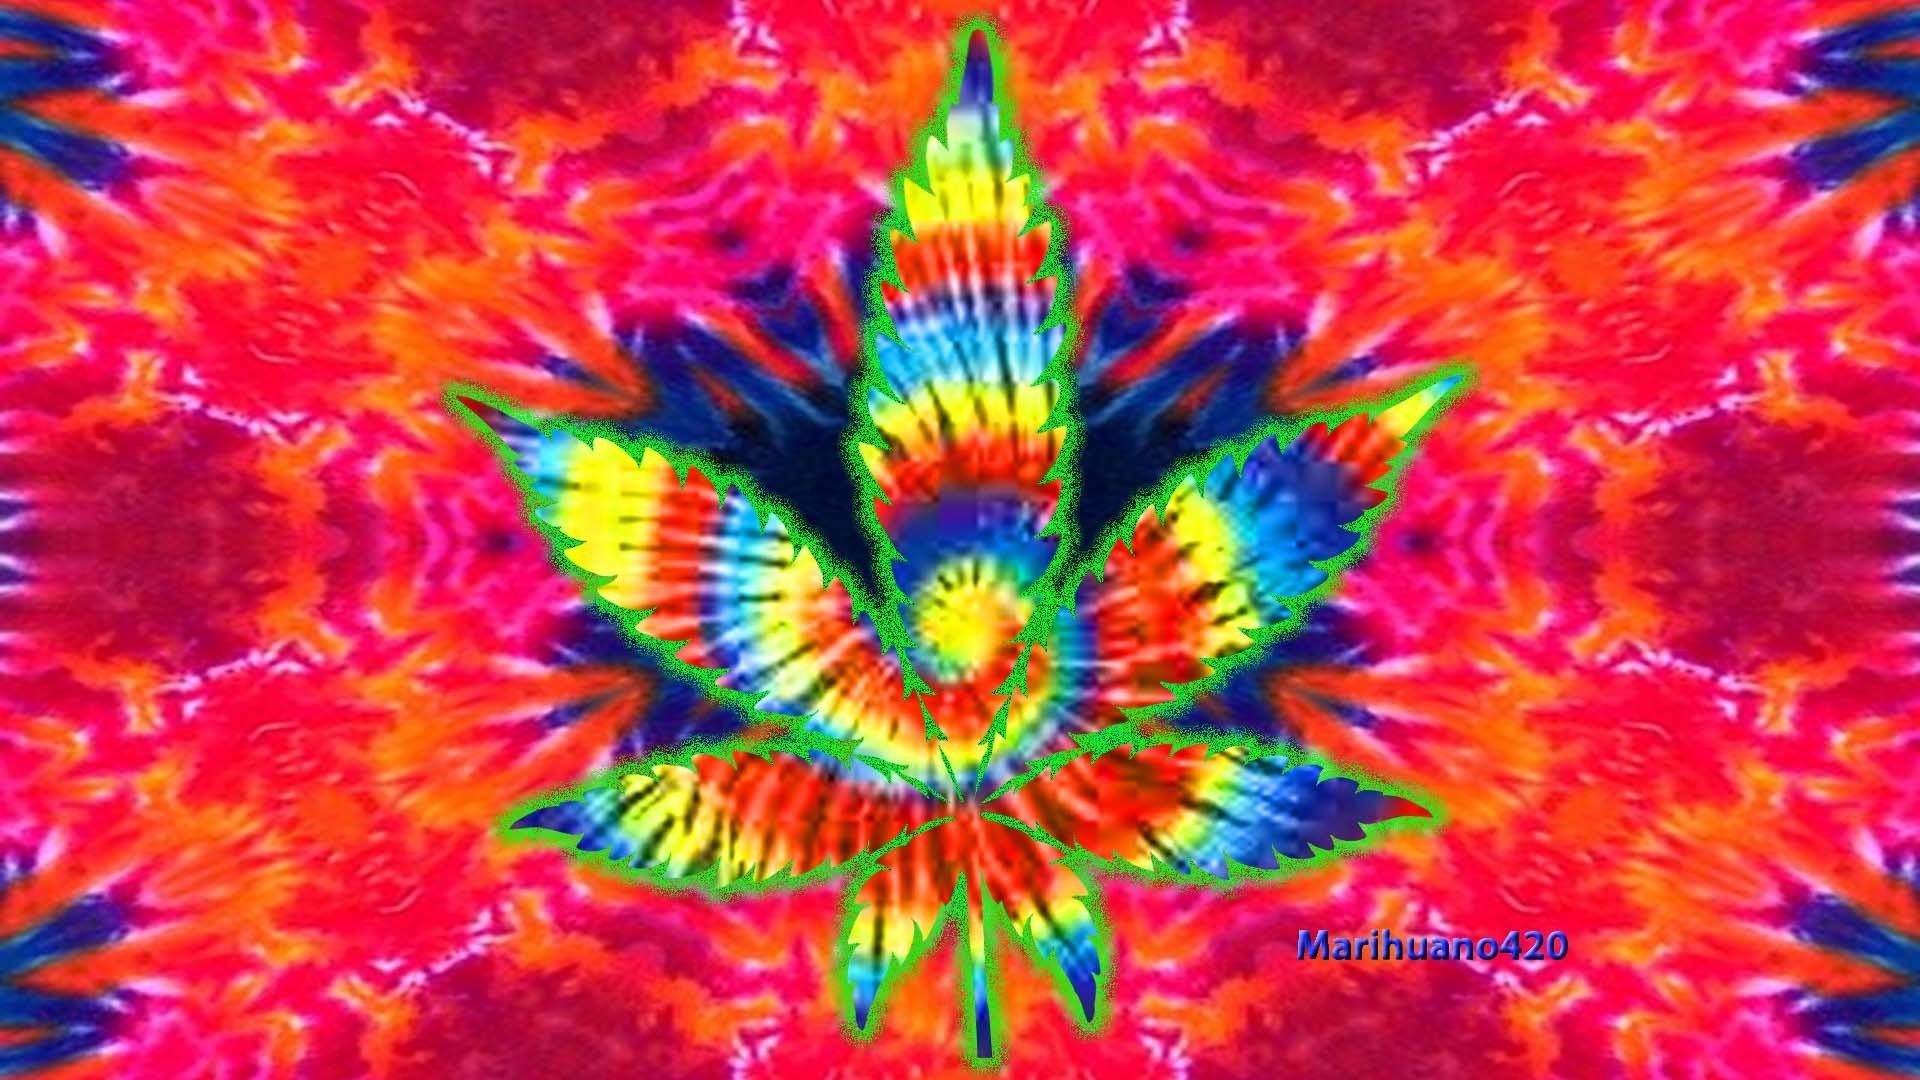 … trippy hippie wallpaper wallpapersafari …